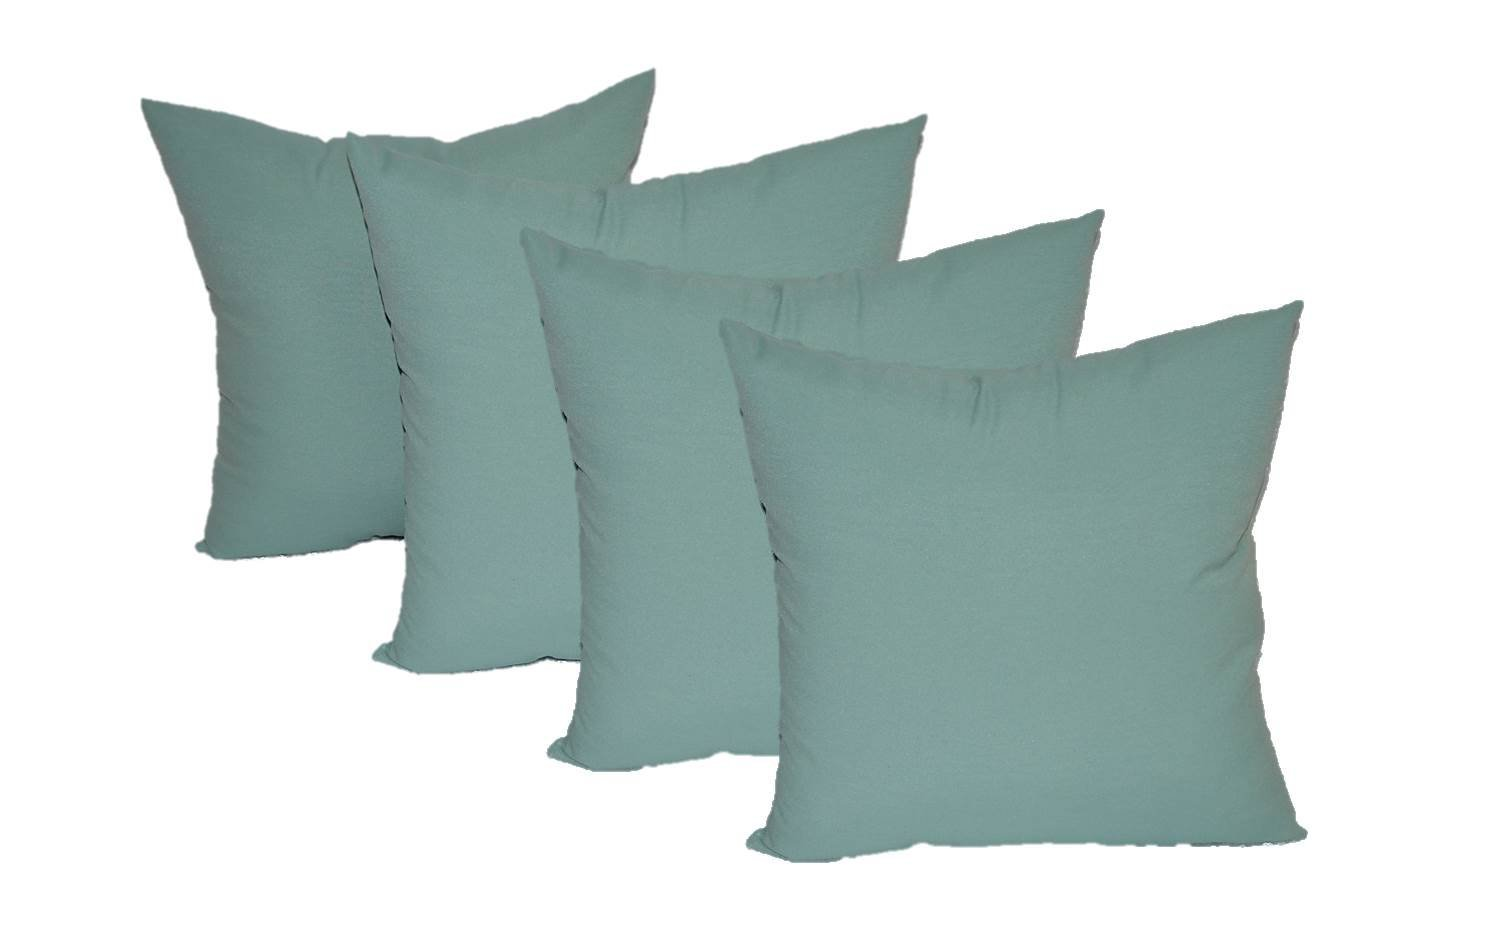 "Set of 4 - Indoor / Outdoor 17"" Square Decorative Throw / Toss Pillows - Solid Aqua / Spa"